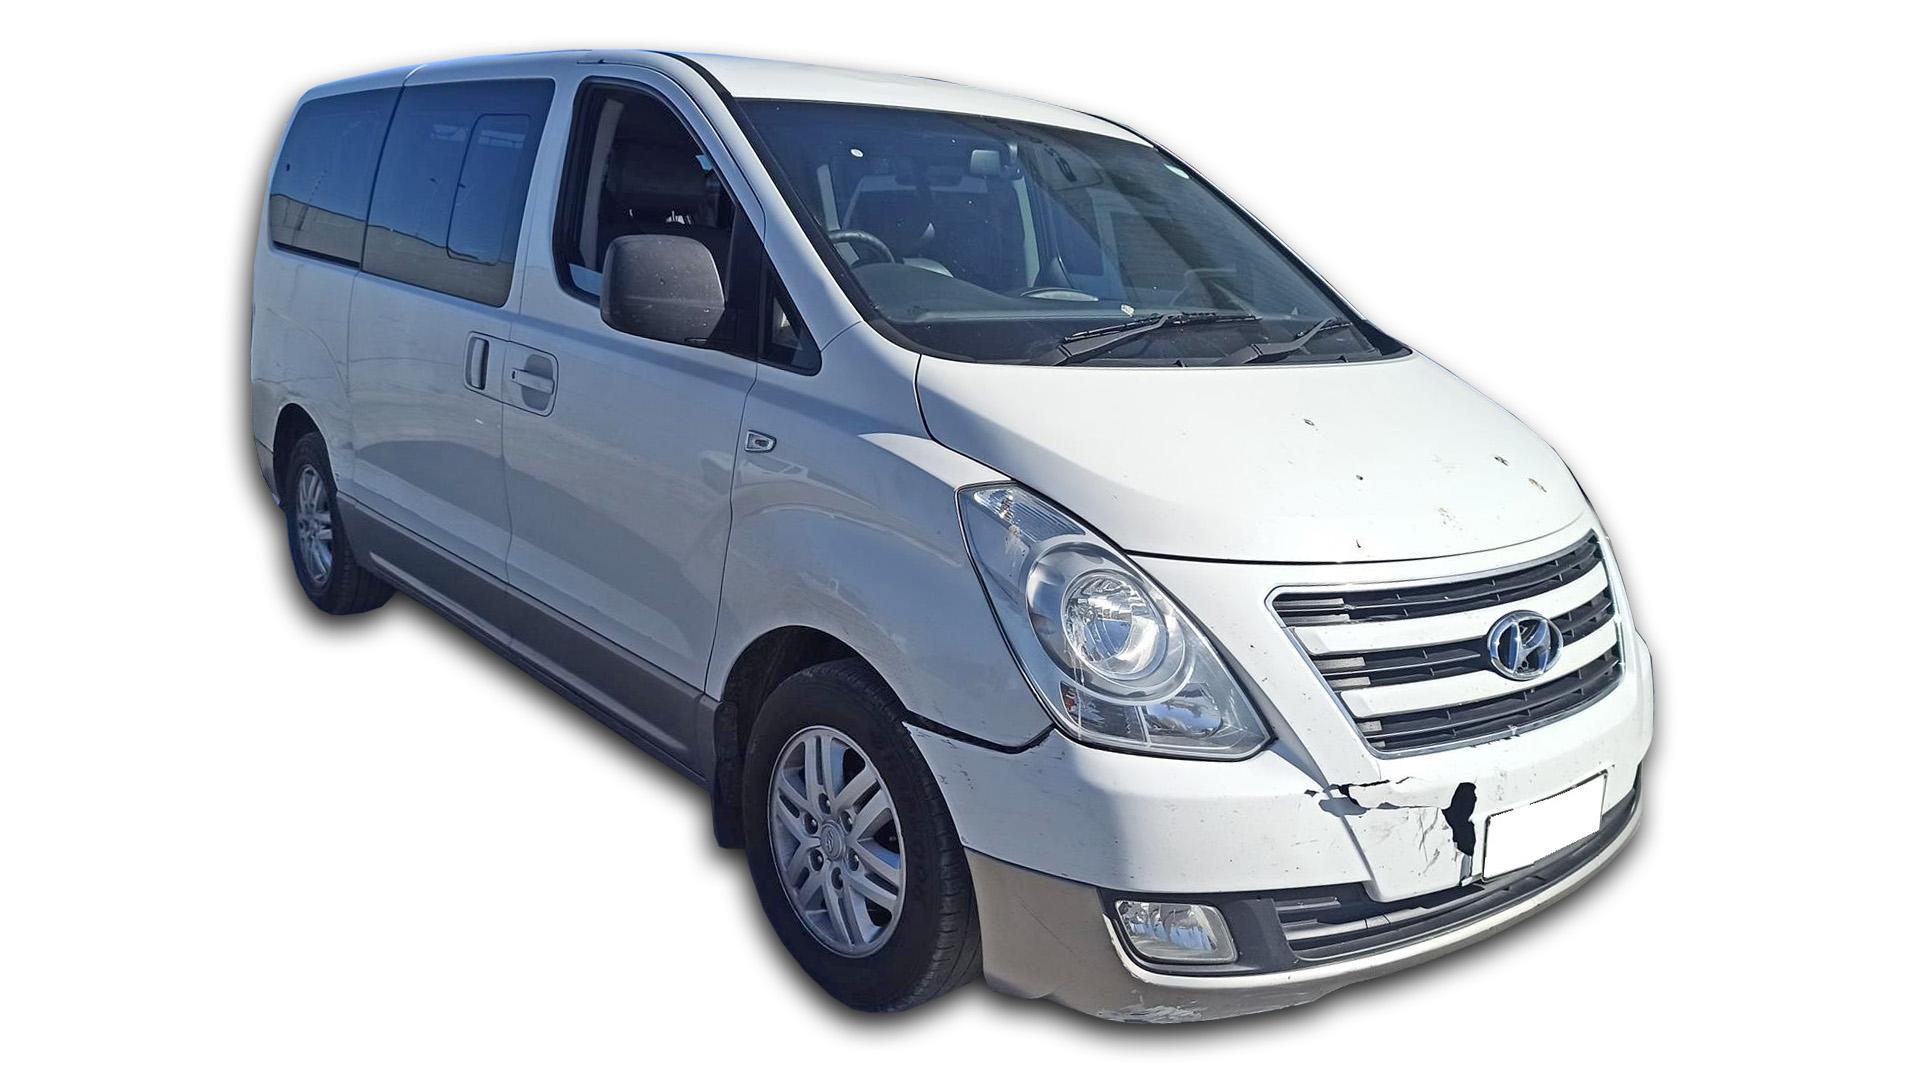 Hyundai H-1 2.5 Crdi (VGT) Wag